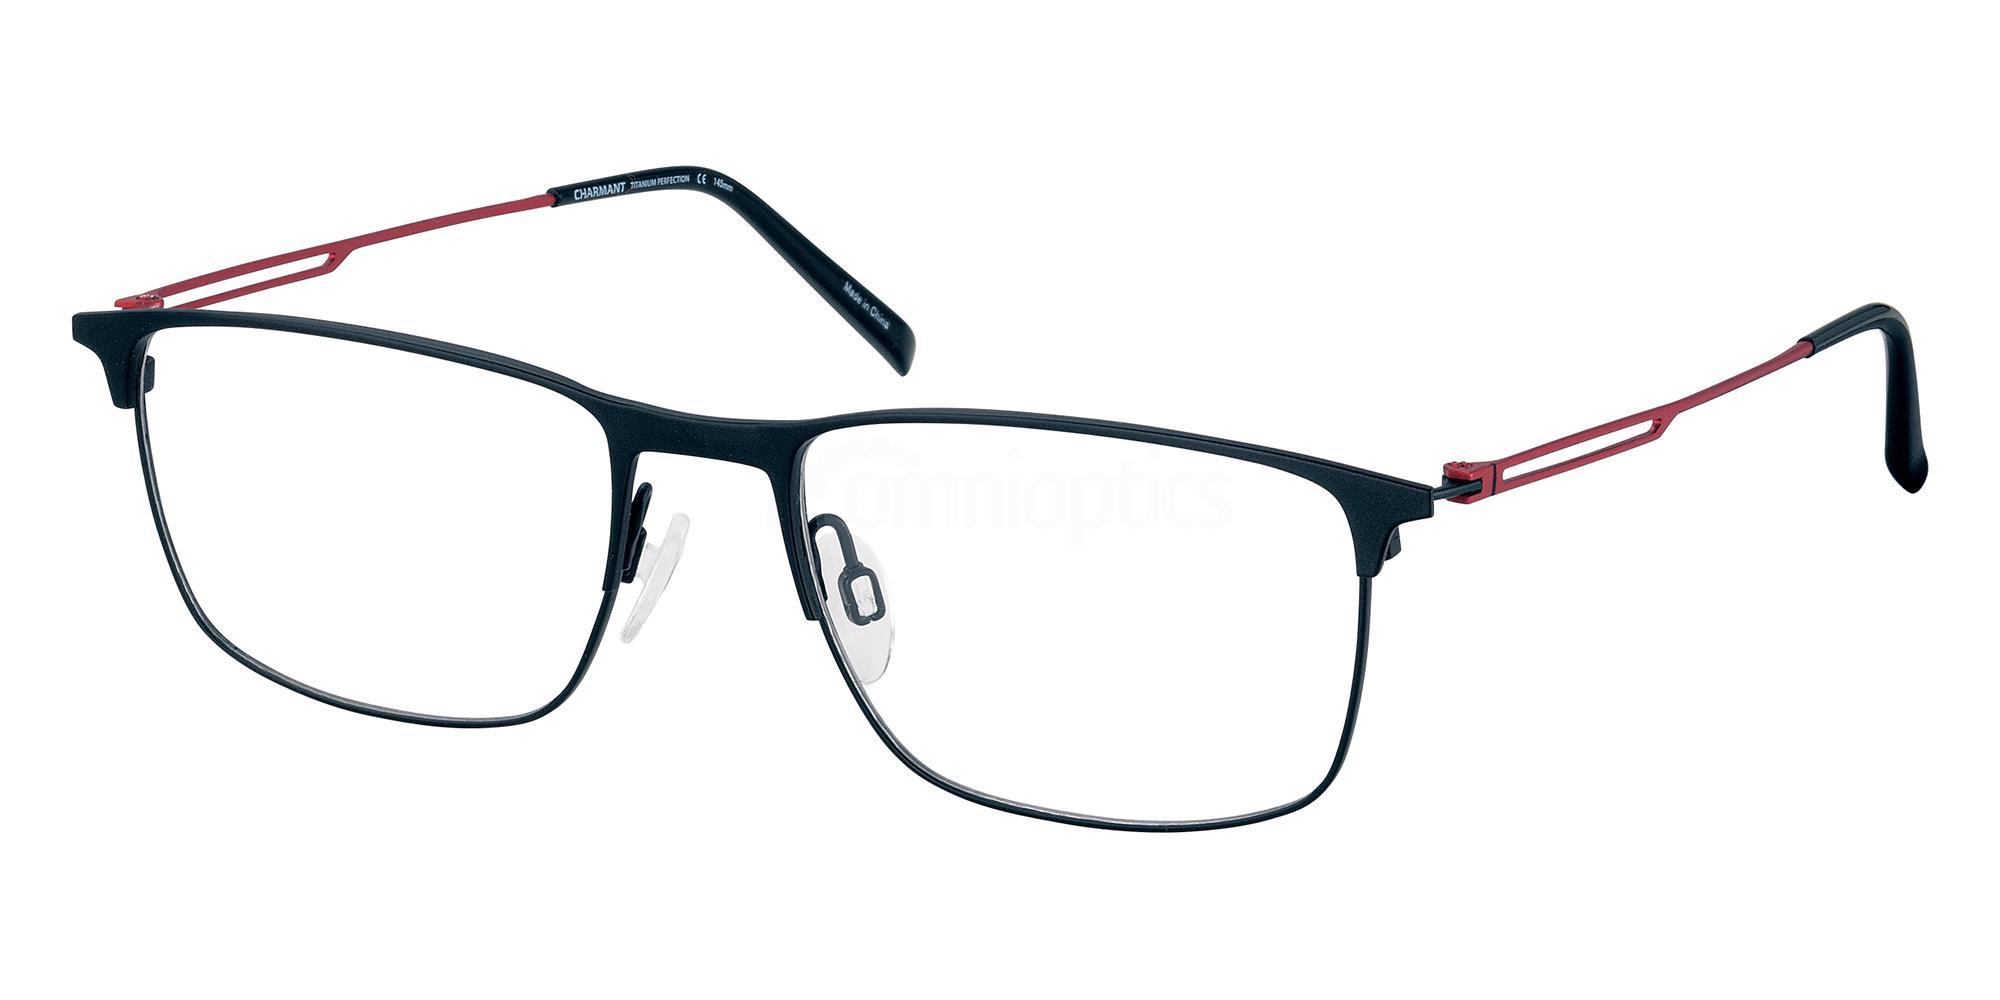 BK CH29719 Glasses, Charmant Titanium Perfection